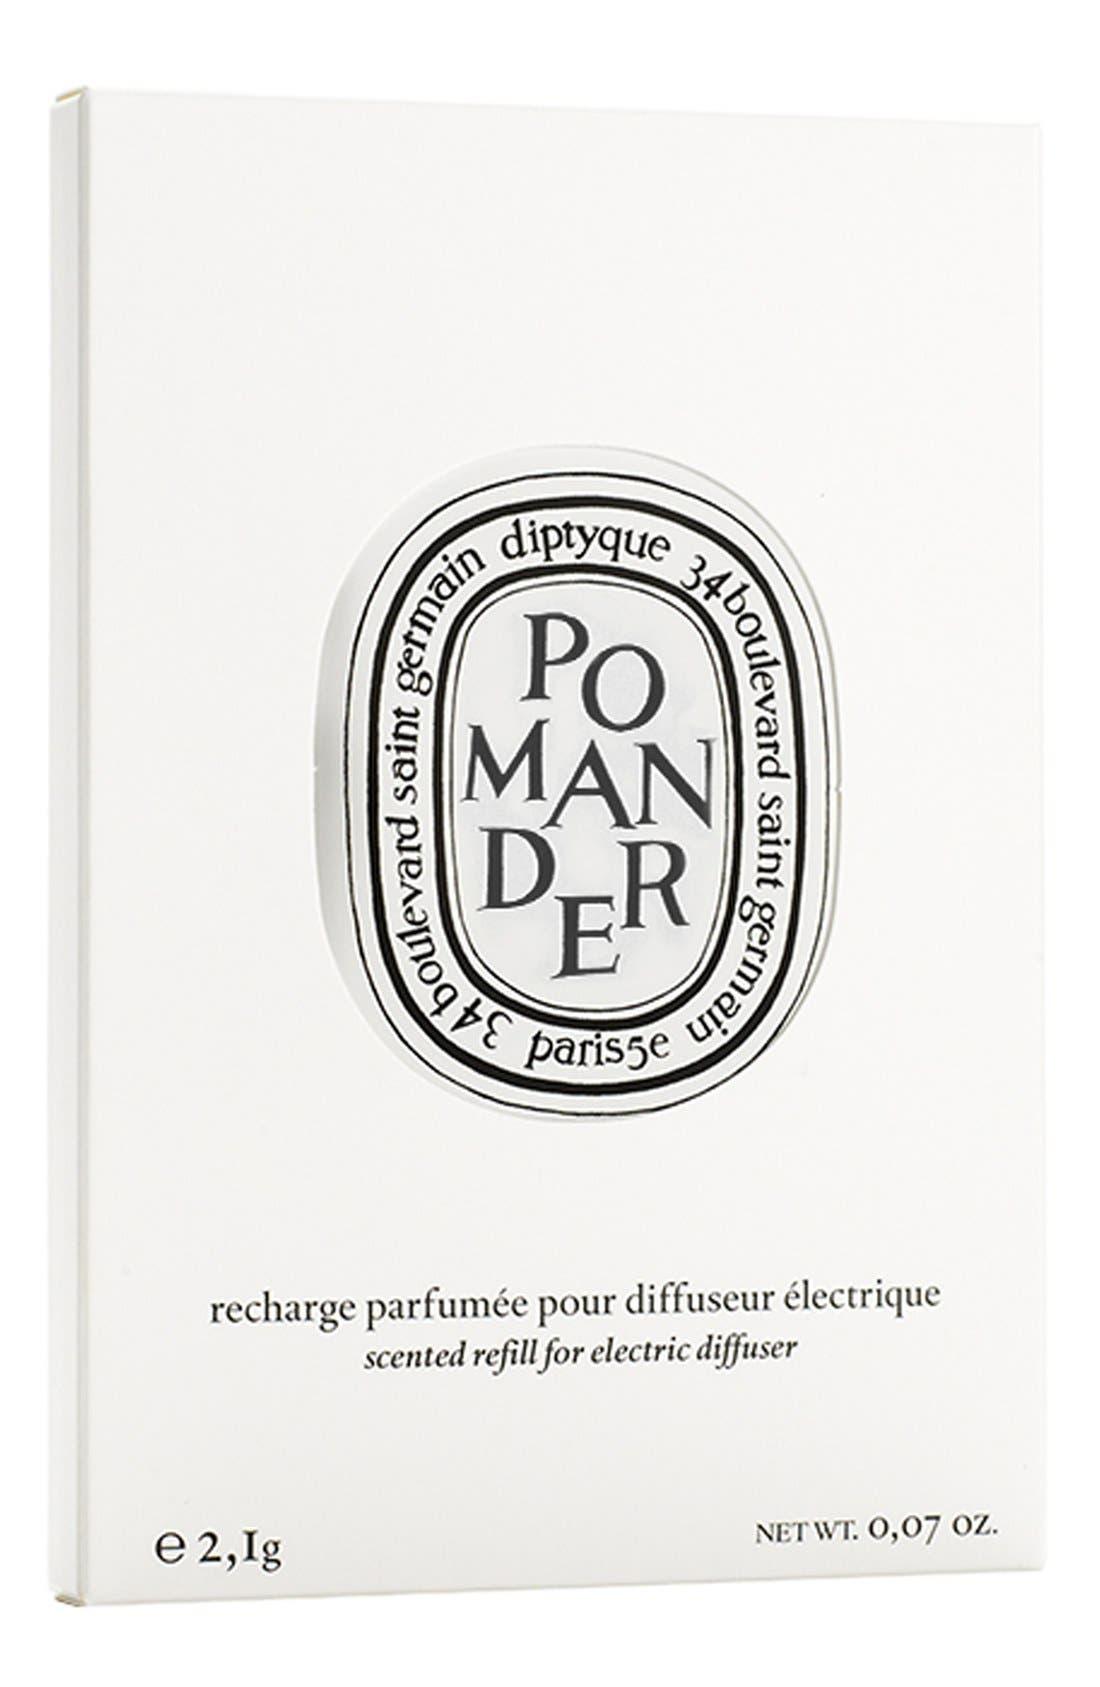 Pomander Electric Diffuser Refill Capsule,                             Alternate thumbnail 2, color,                             000